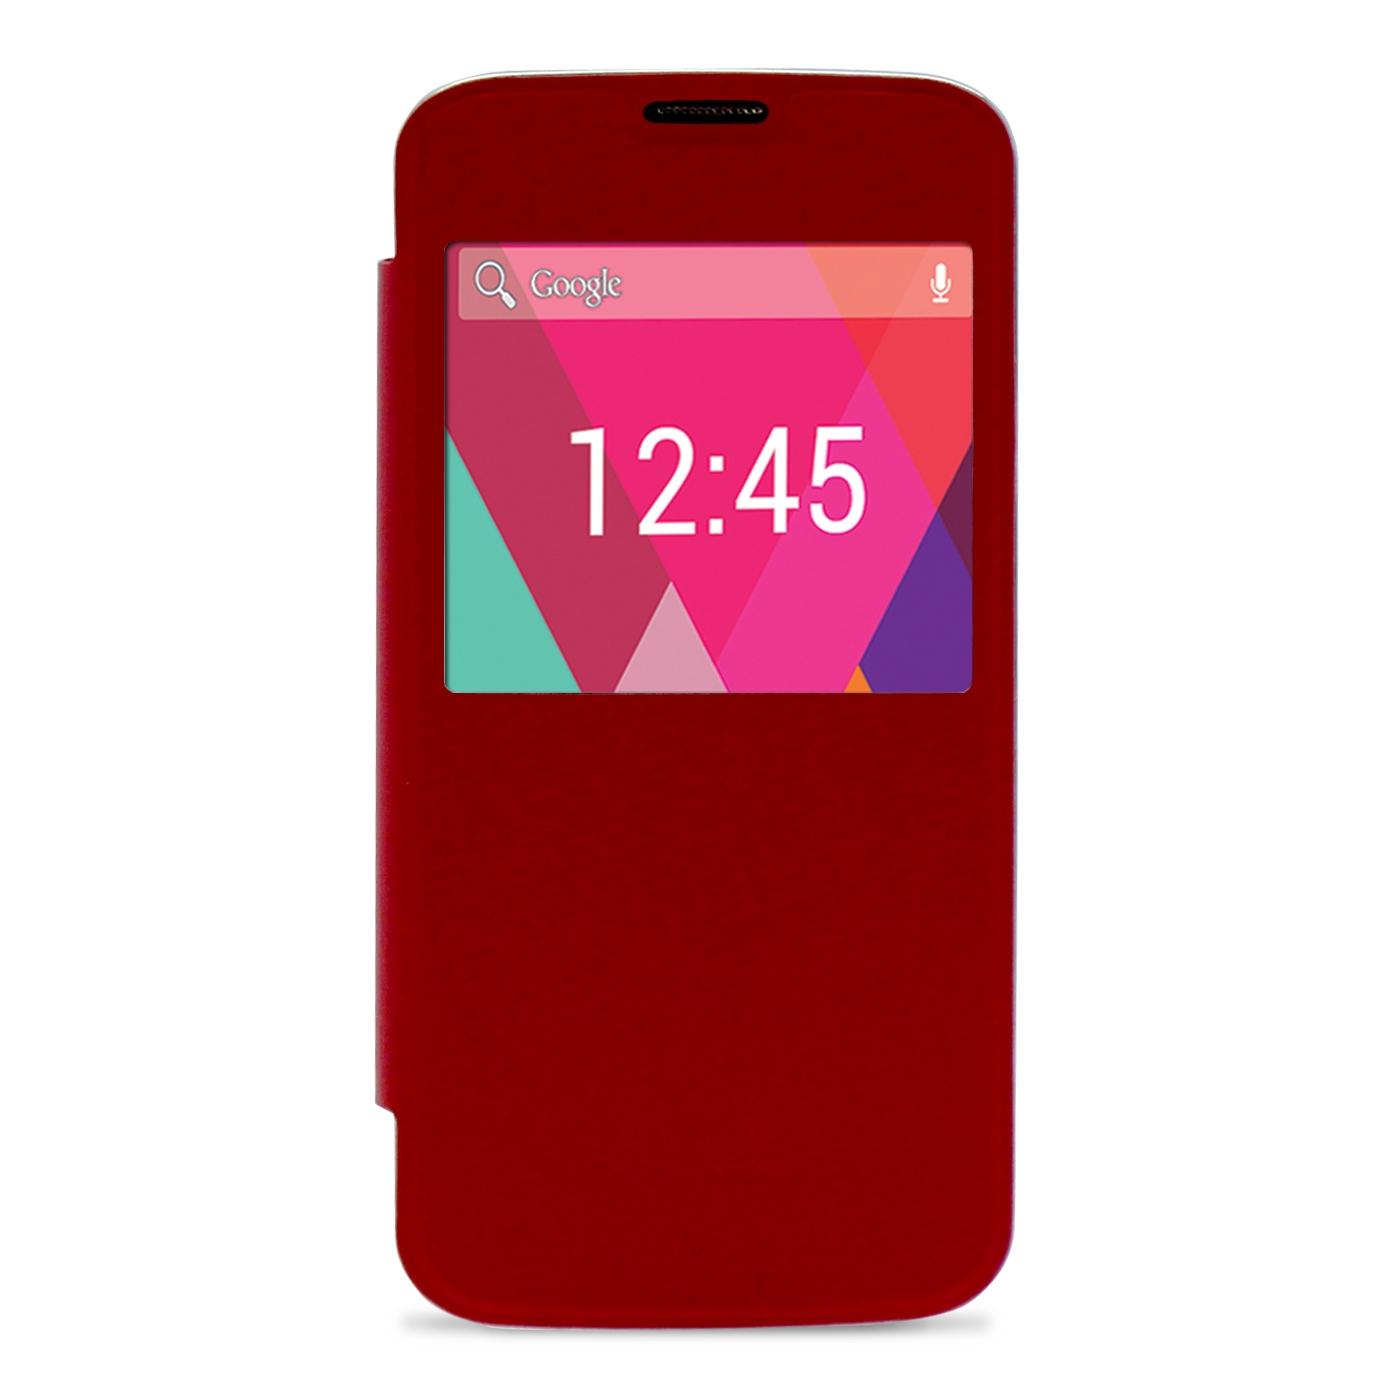 Funda Slim Cover Case  Phoenix Para Telefono Smartphone  Phrockx1 5 Pulgadas Rojo PHROCKX1SLIMCASER